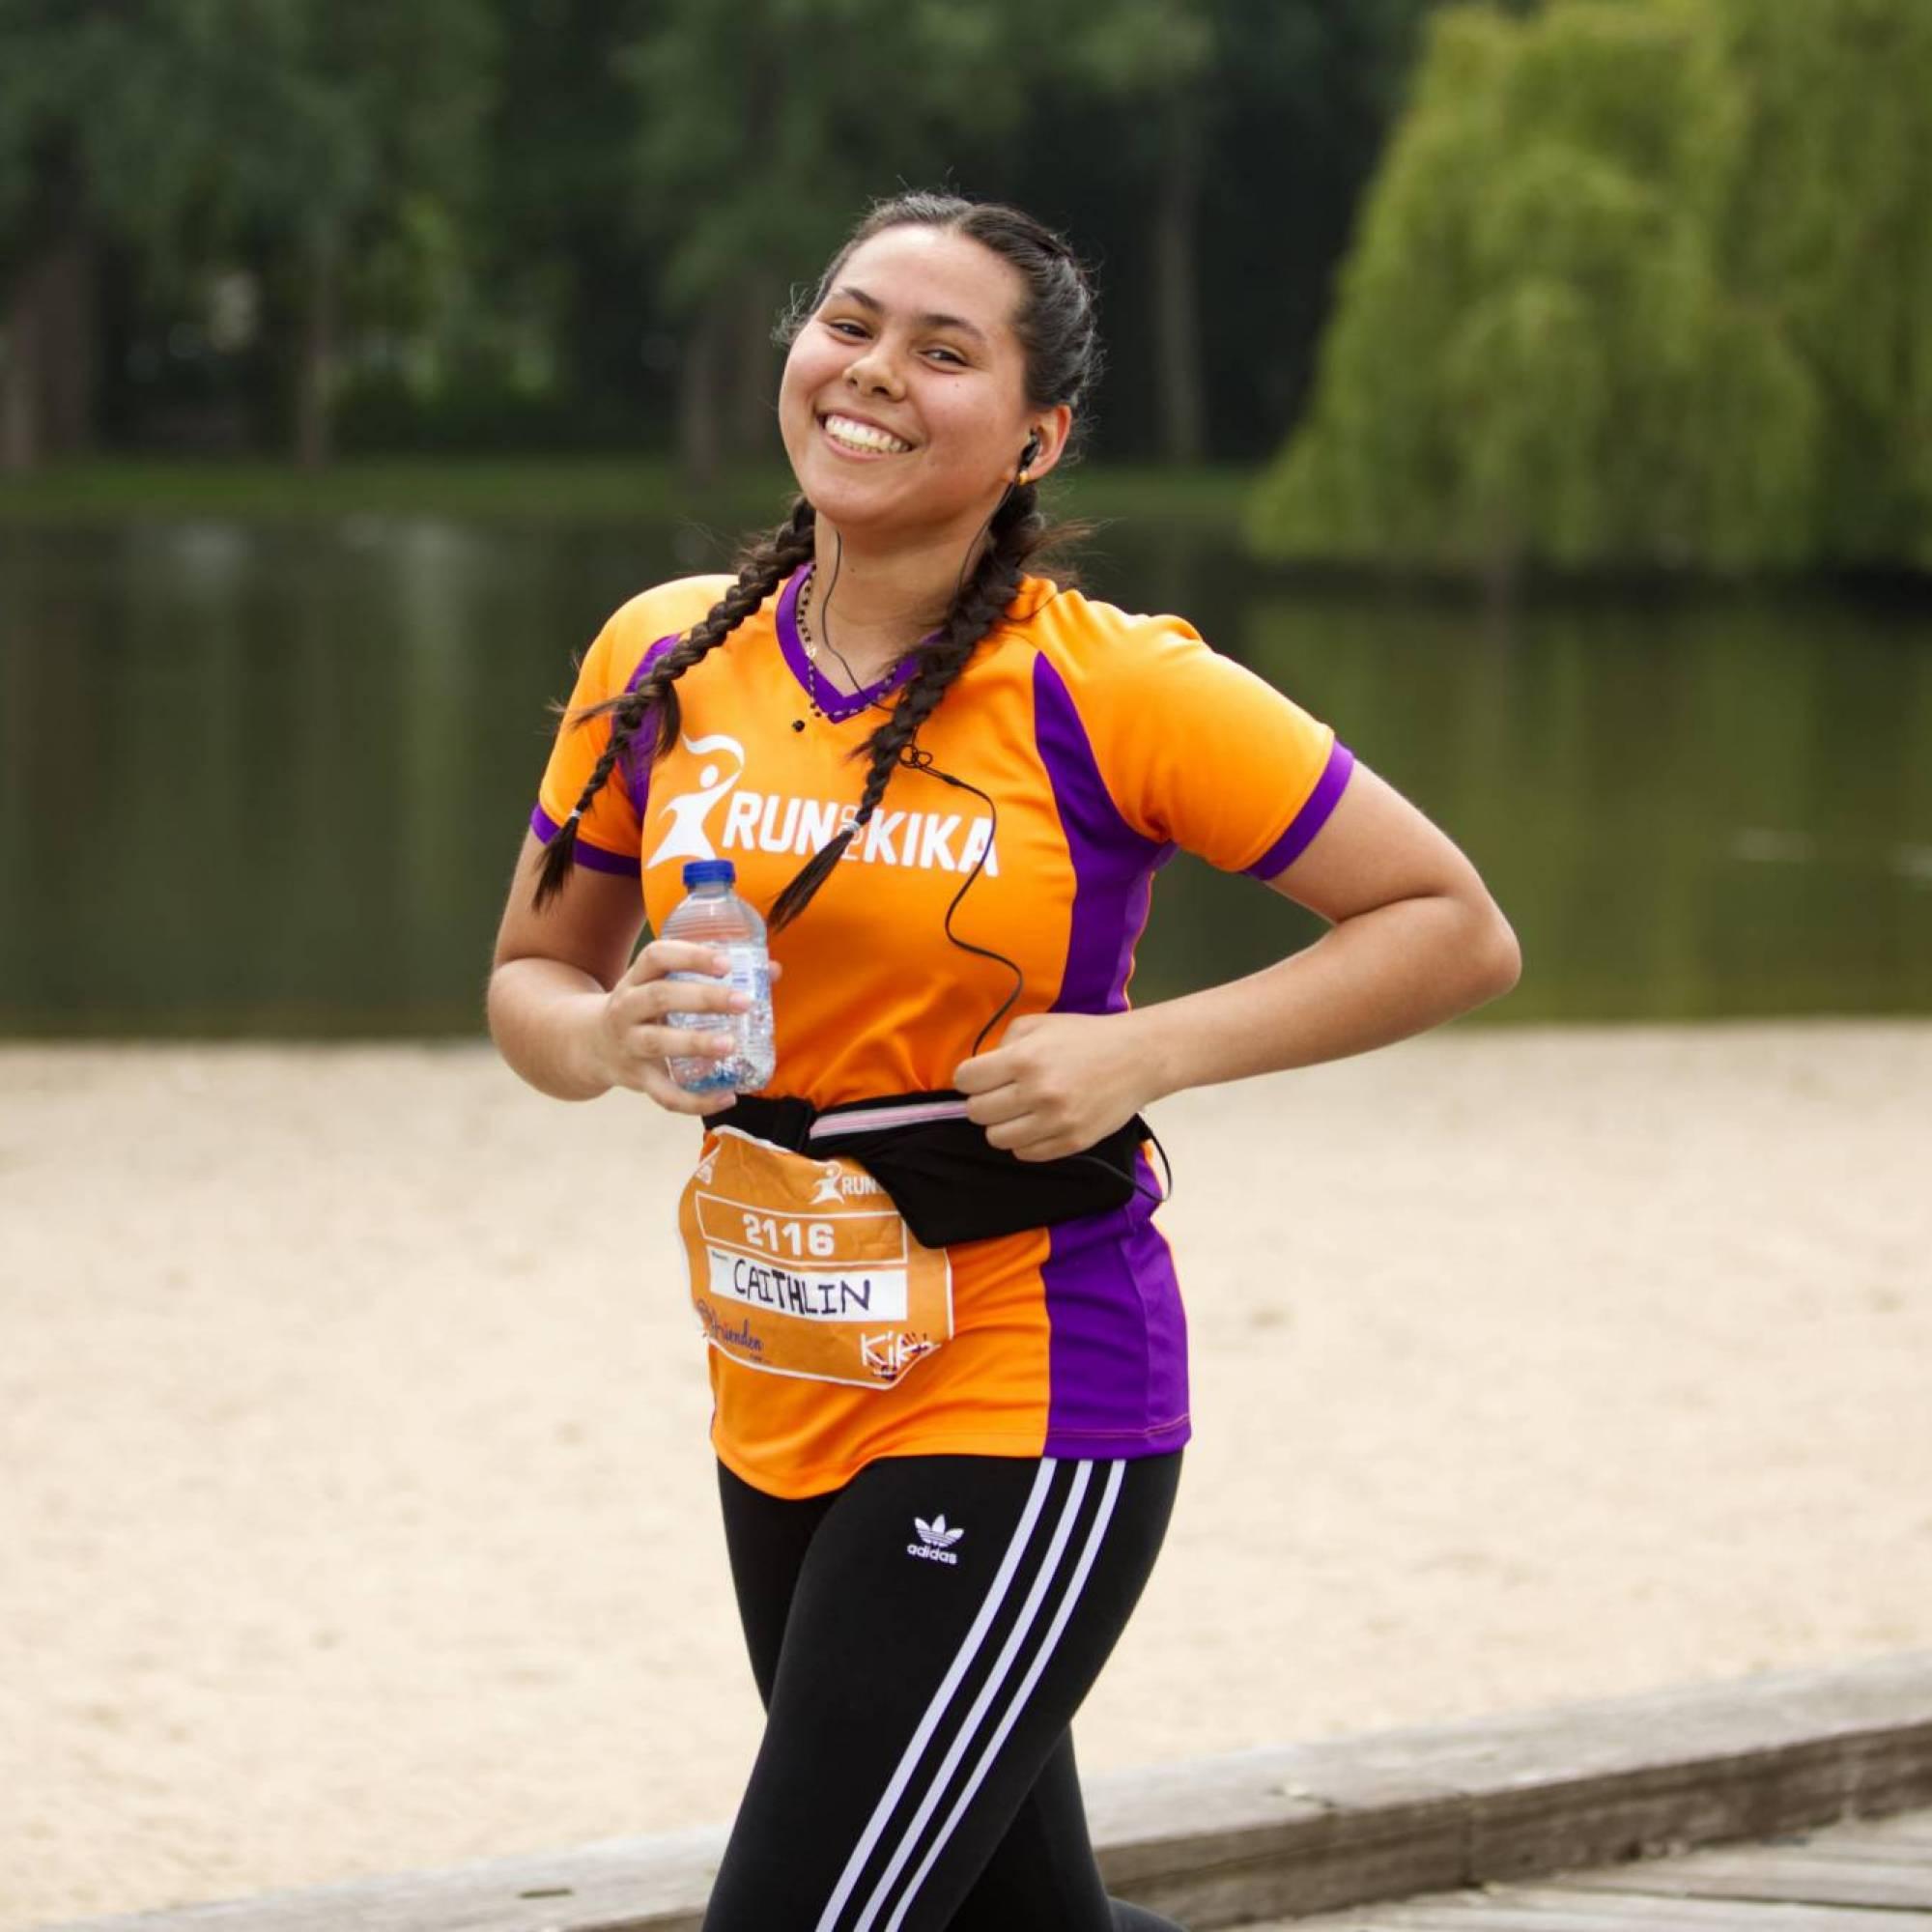 Meisje met Run for KiKa shirt loopt met waterflesje in hand, water op de achtergrond.